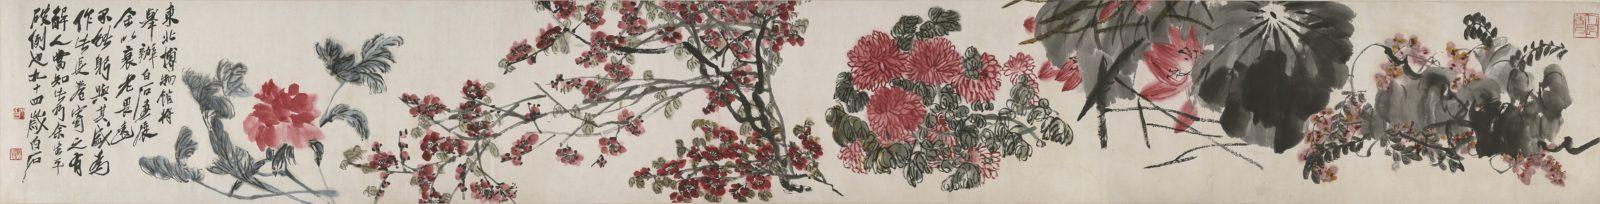 Qi Baishi, Flowers in Broken Branches, comuseum.com